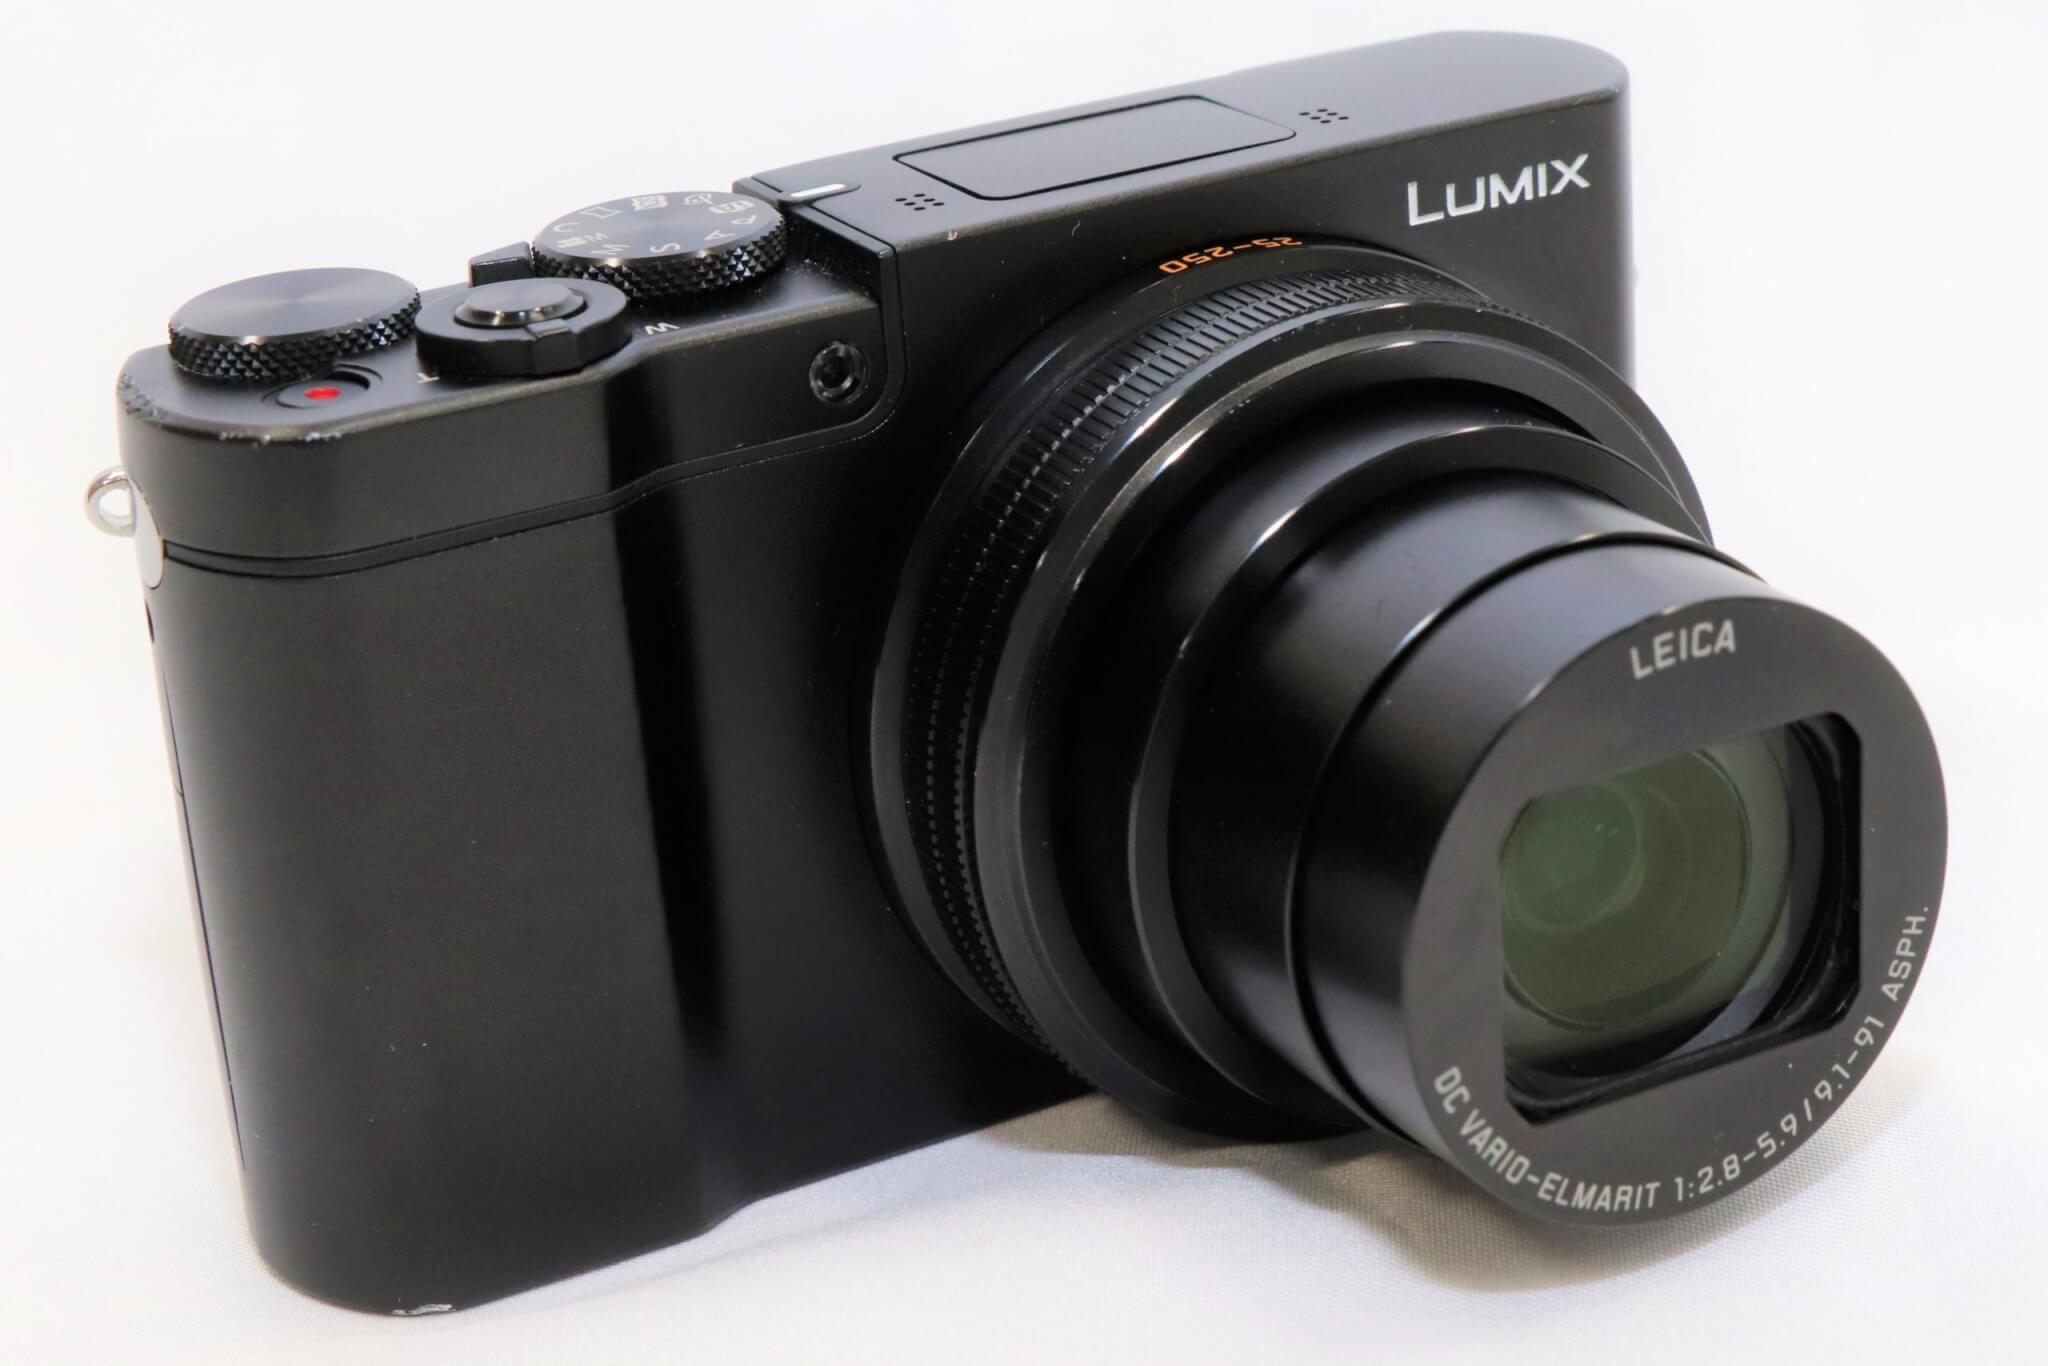 Panasonic LUMIX DMC-TX1実写レビュー!高倍率+携帯性+高性能を兼ね備えた「プレミアムコンパクト」の実力